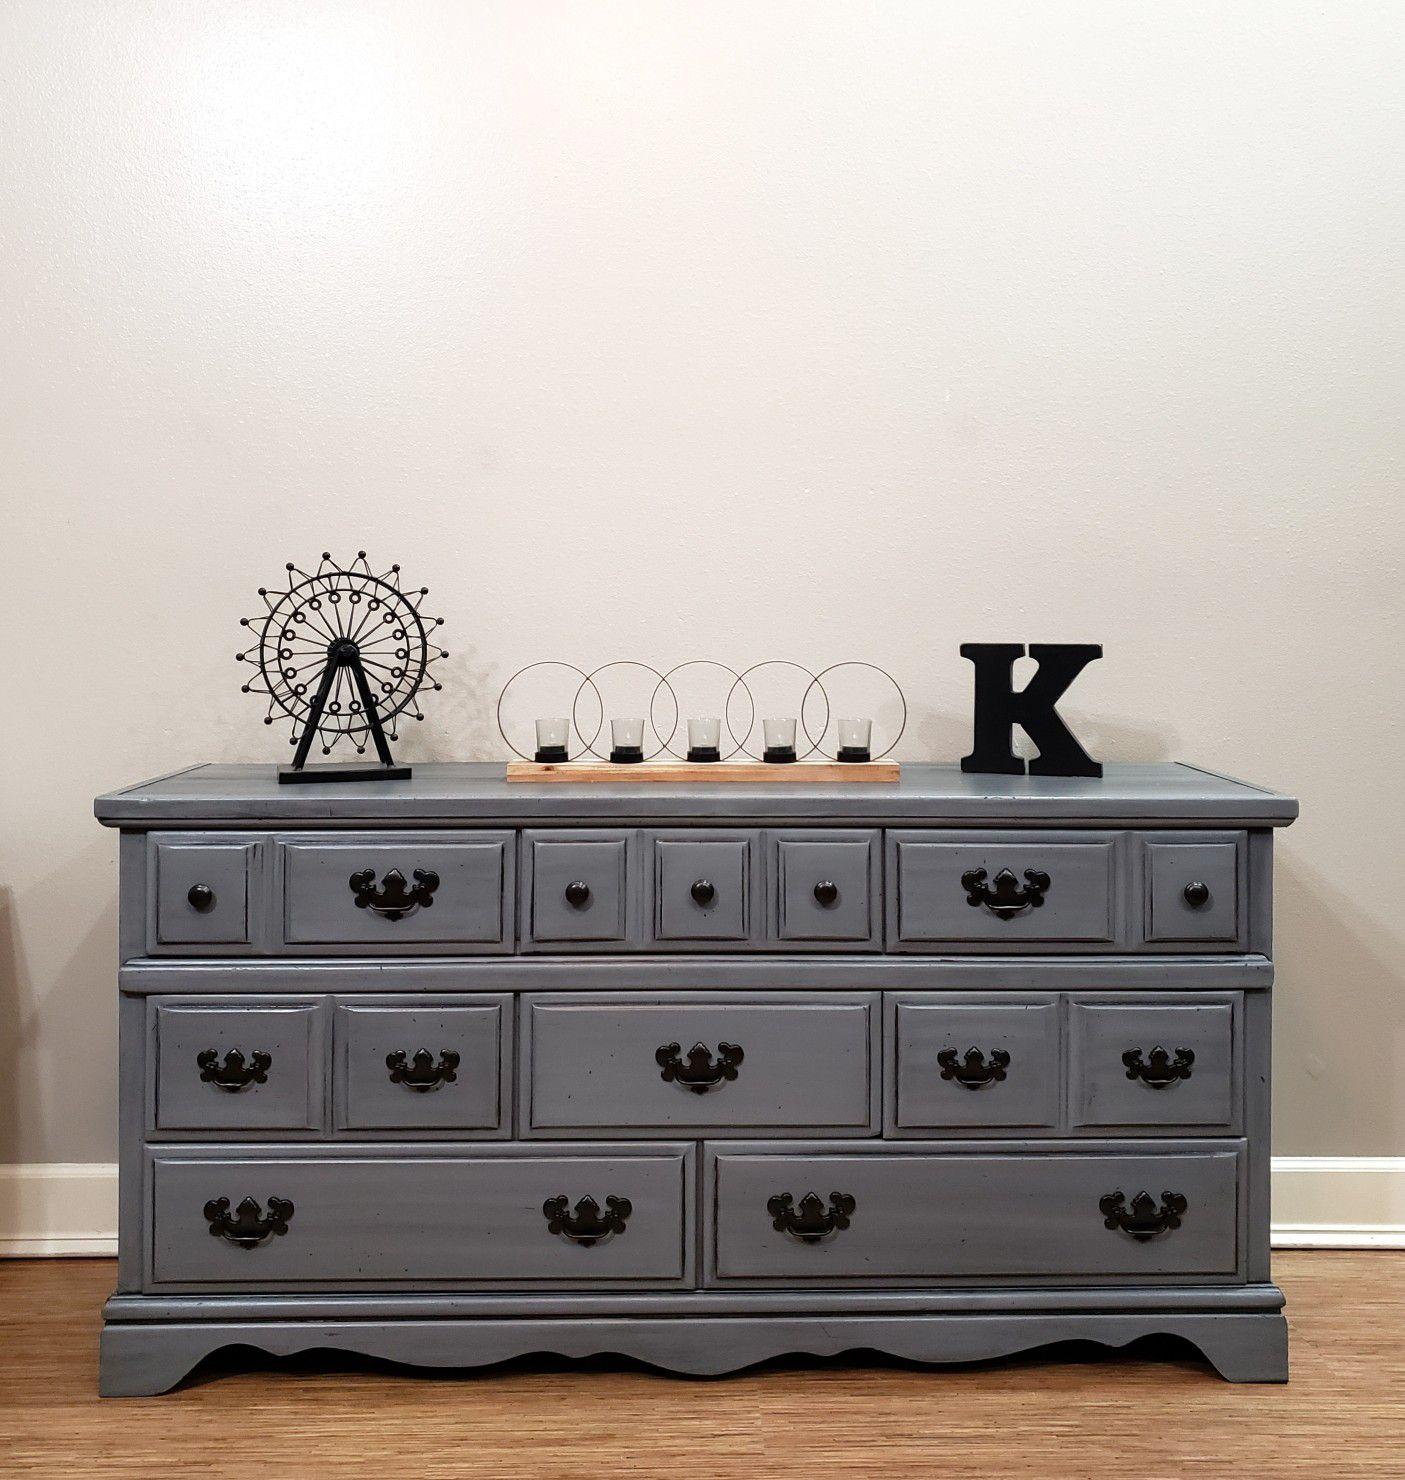 Beautiful hand painted dresser